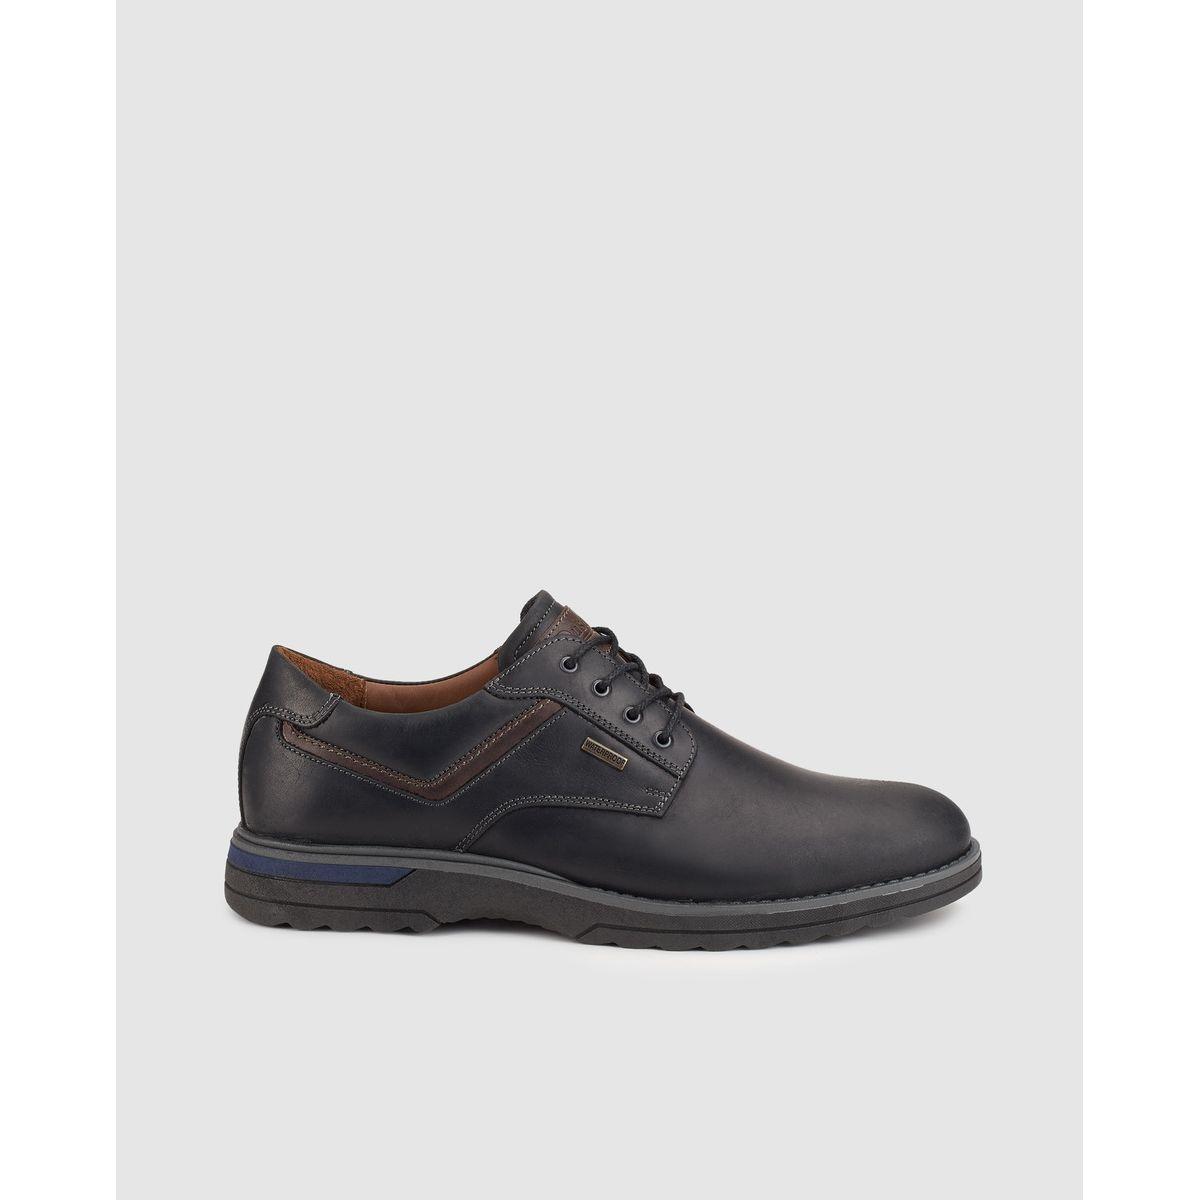 Chaussures à lacets   technologie Waterproof